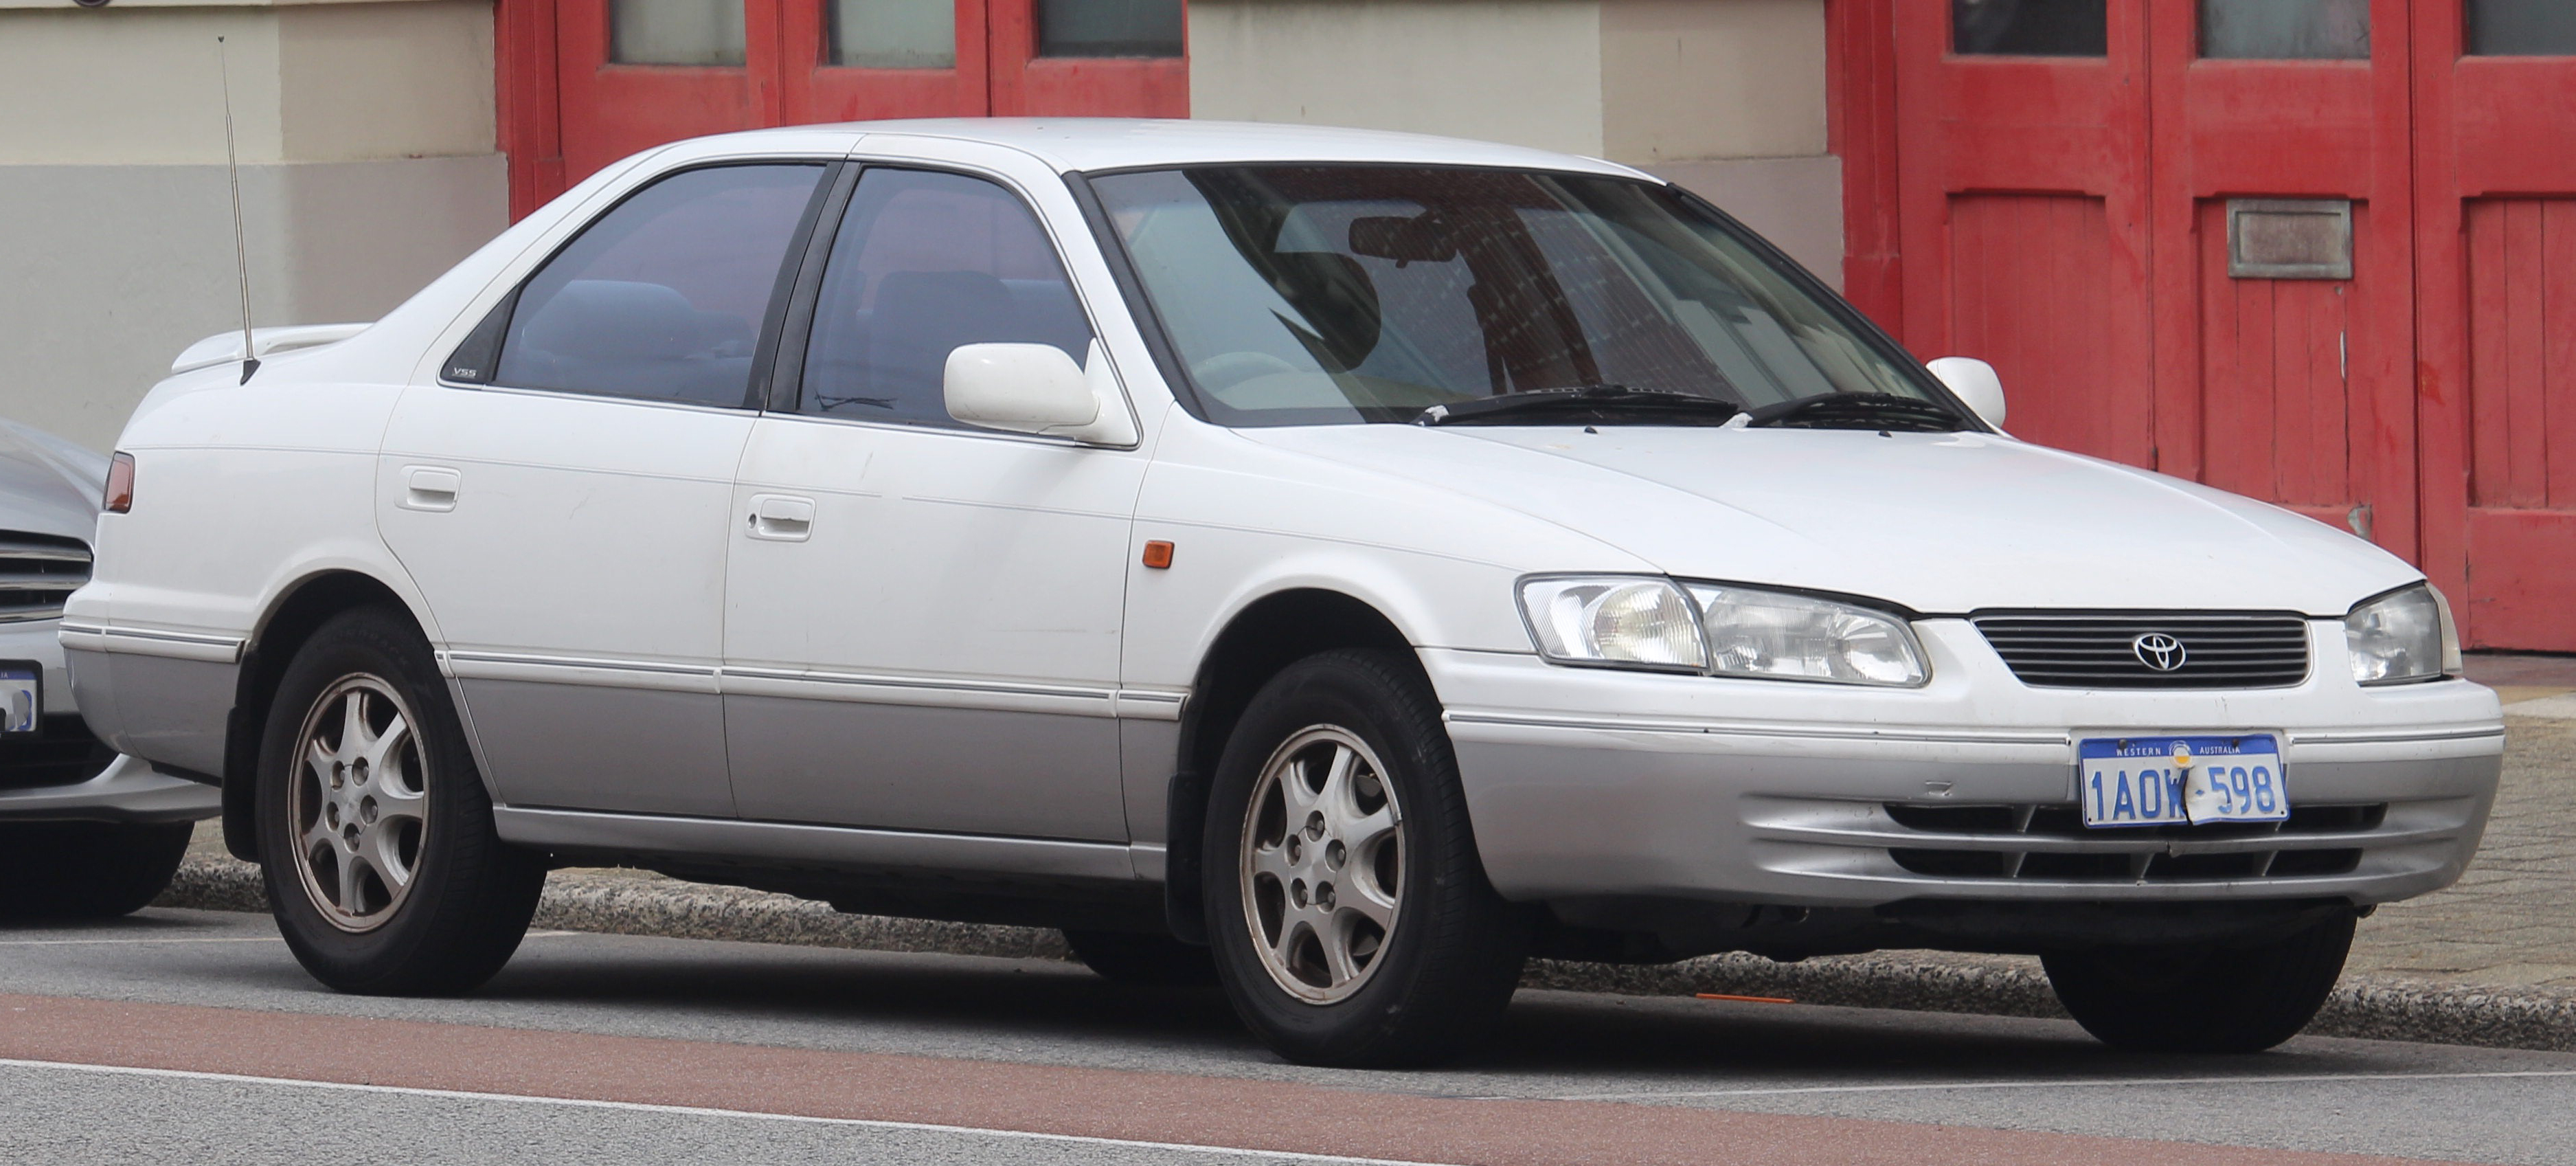 Kelebihan Toyota Camry 98 Murah Berkualitas